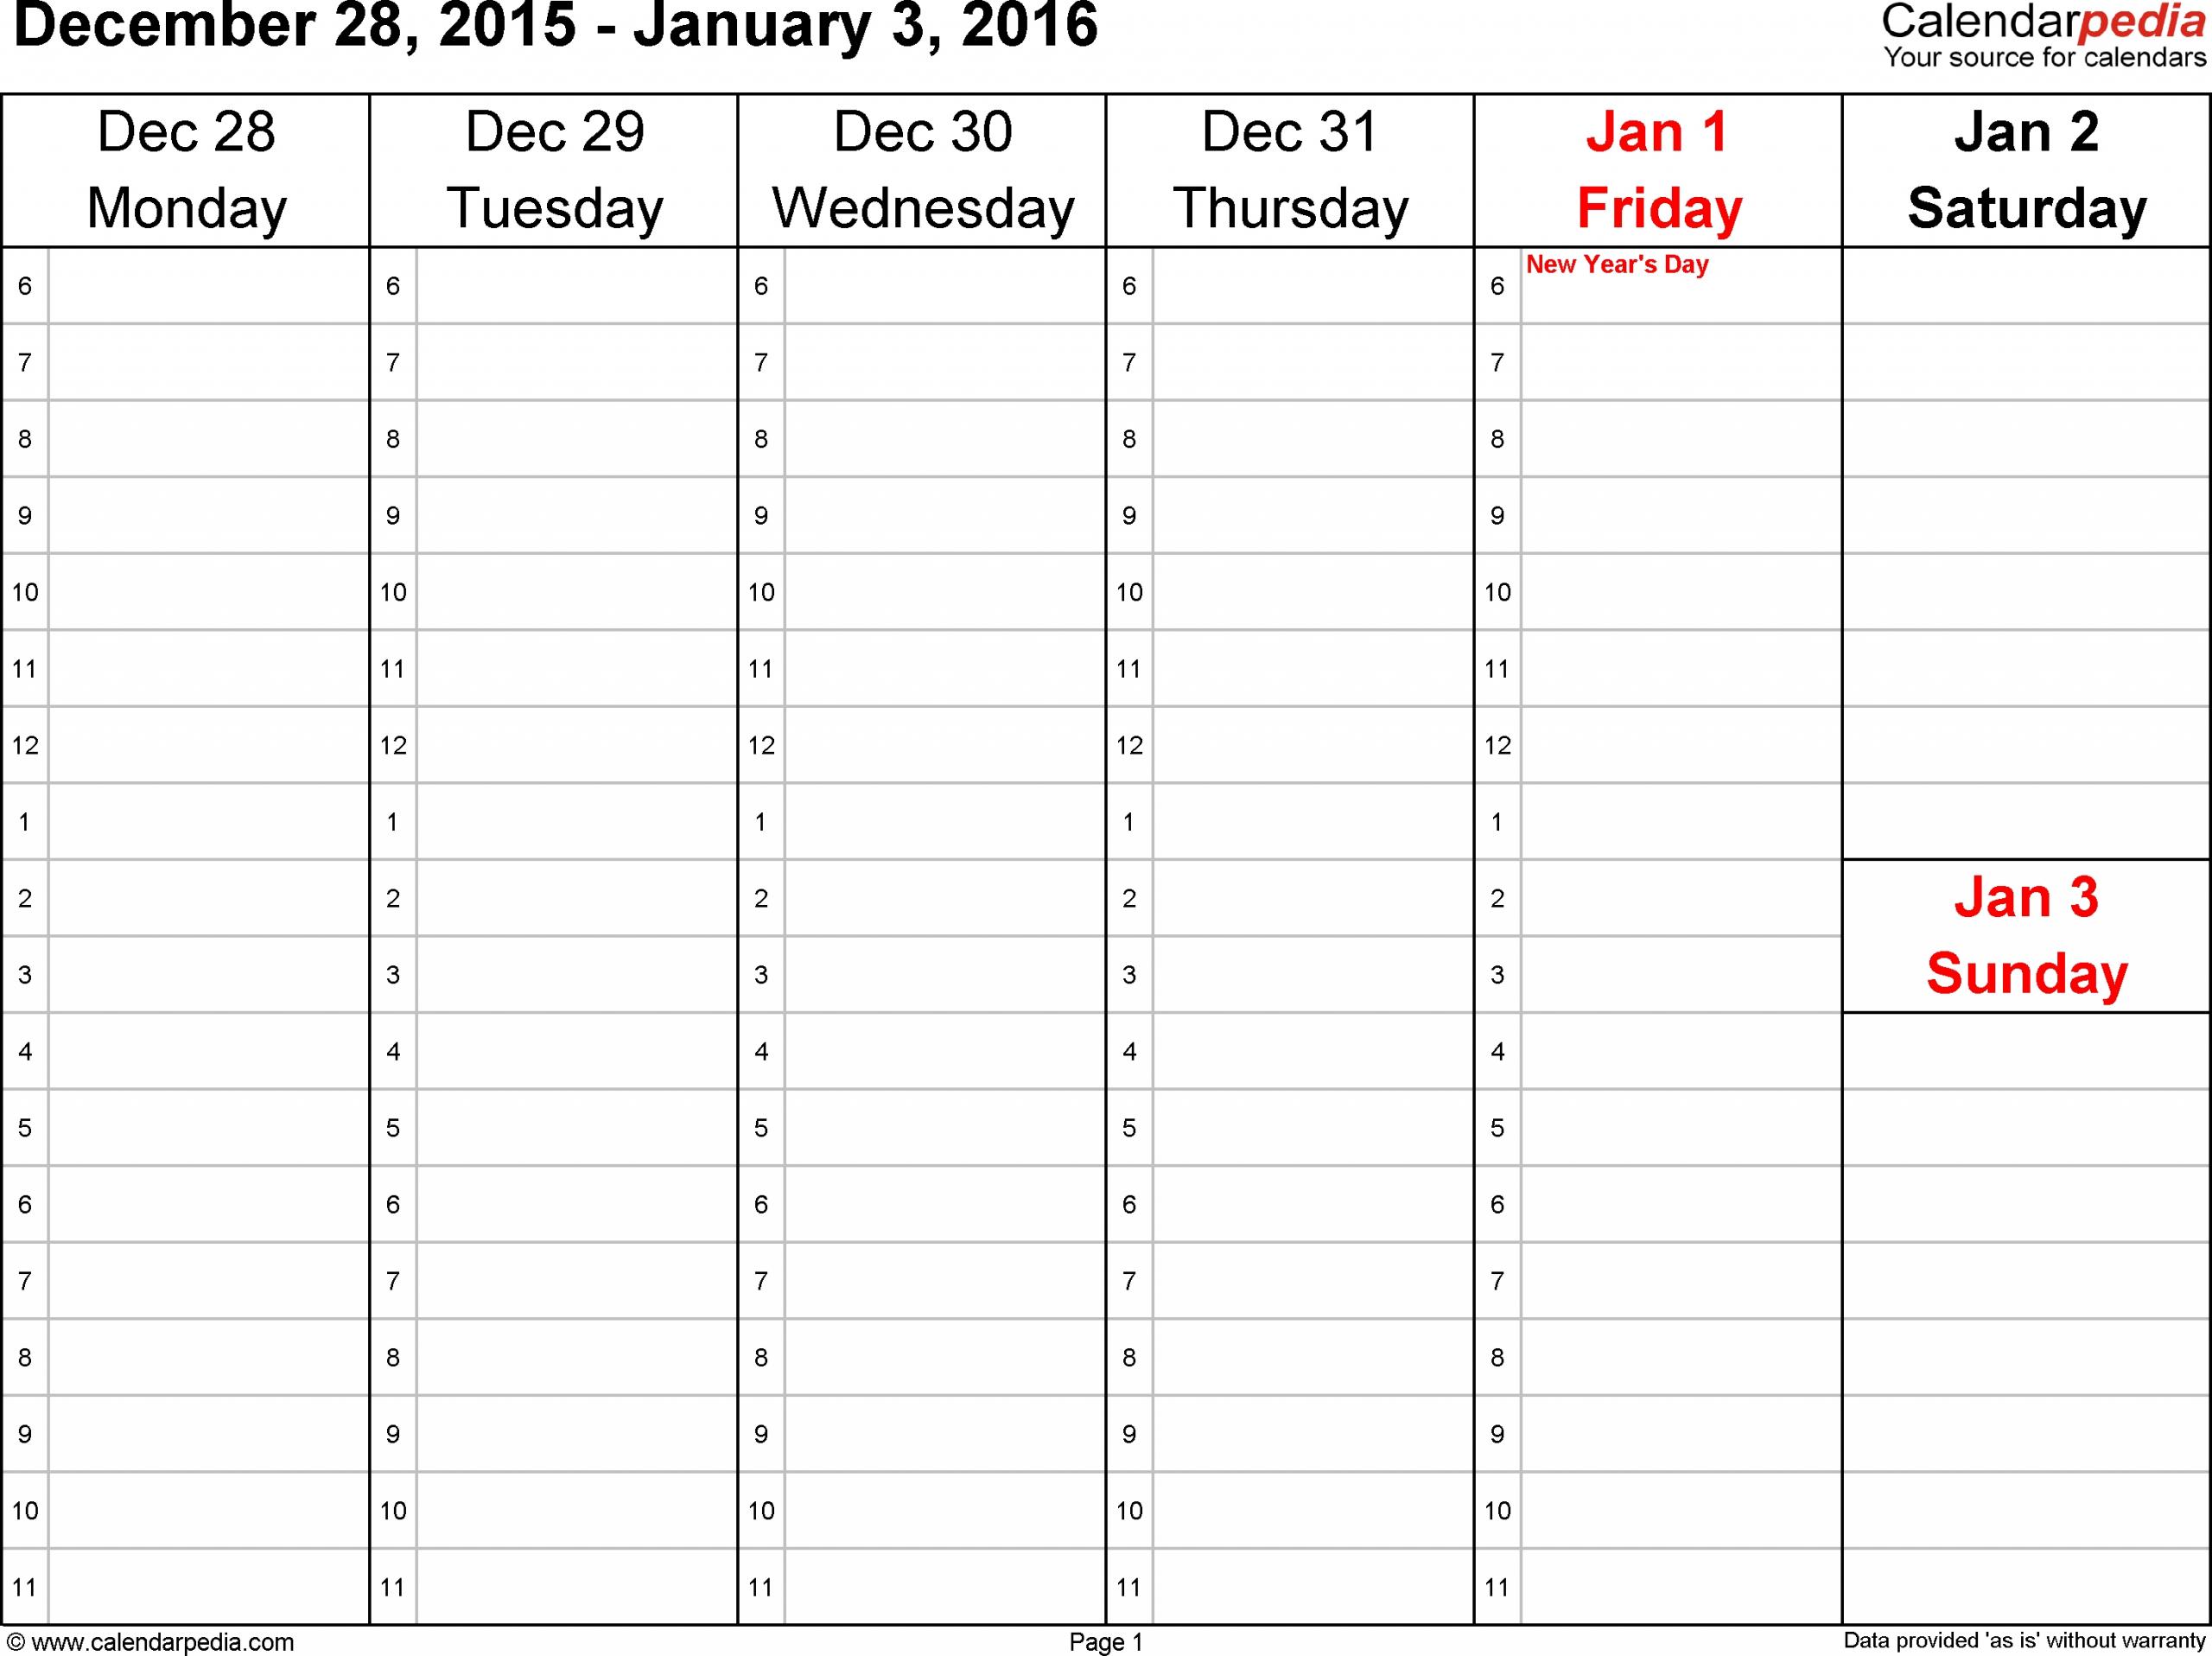 Weekly Calendar 2016 For Word - 12 Free Printable Templates with regard to Printable Weekly Calendar Monday Start